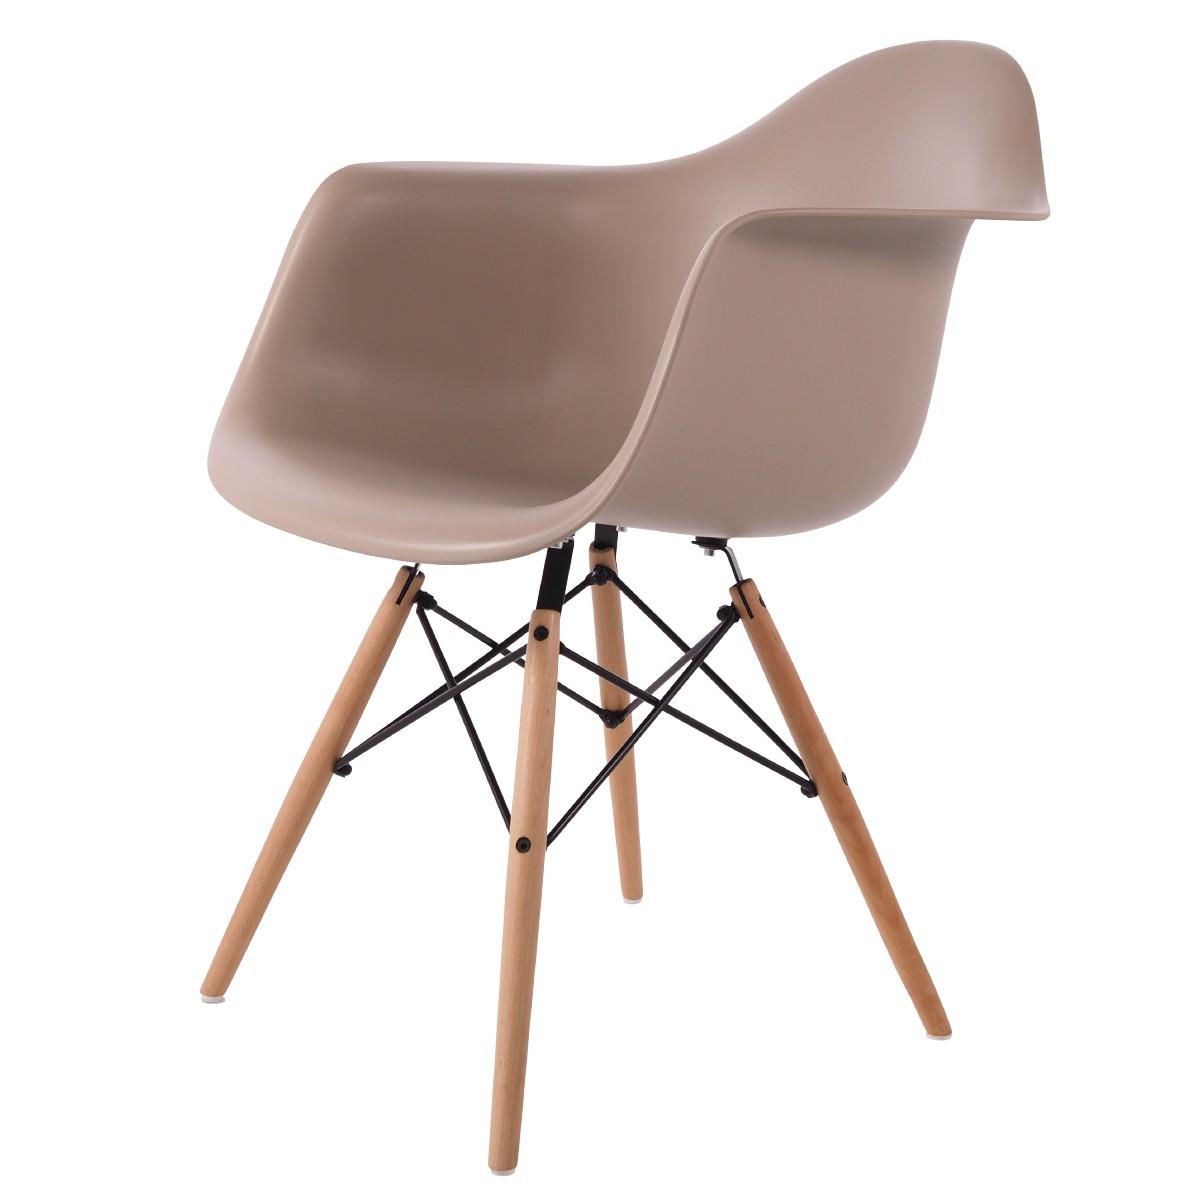 Charles Eames,spisestue stol DD DAW PP lysegrå